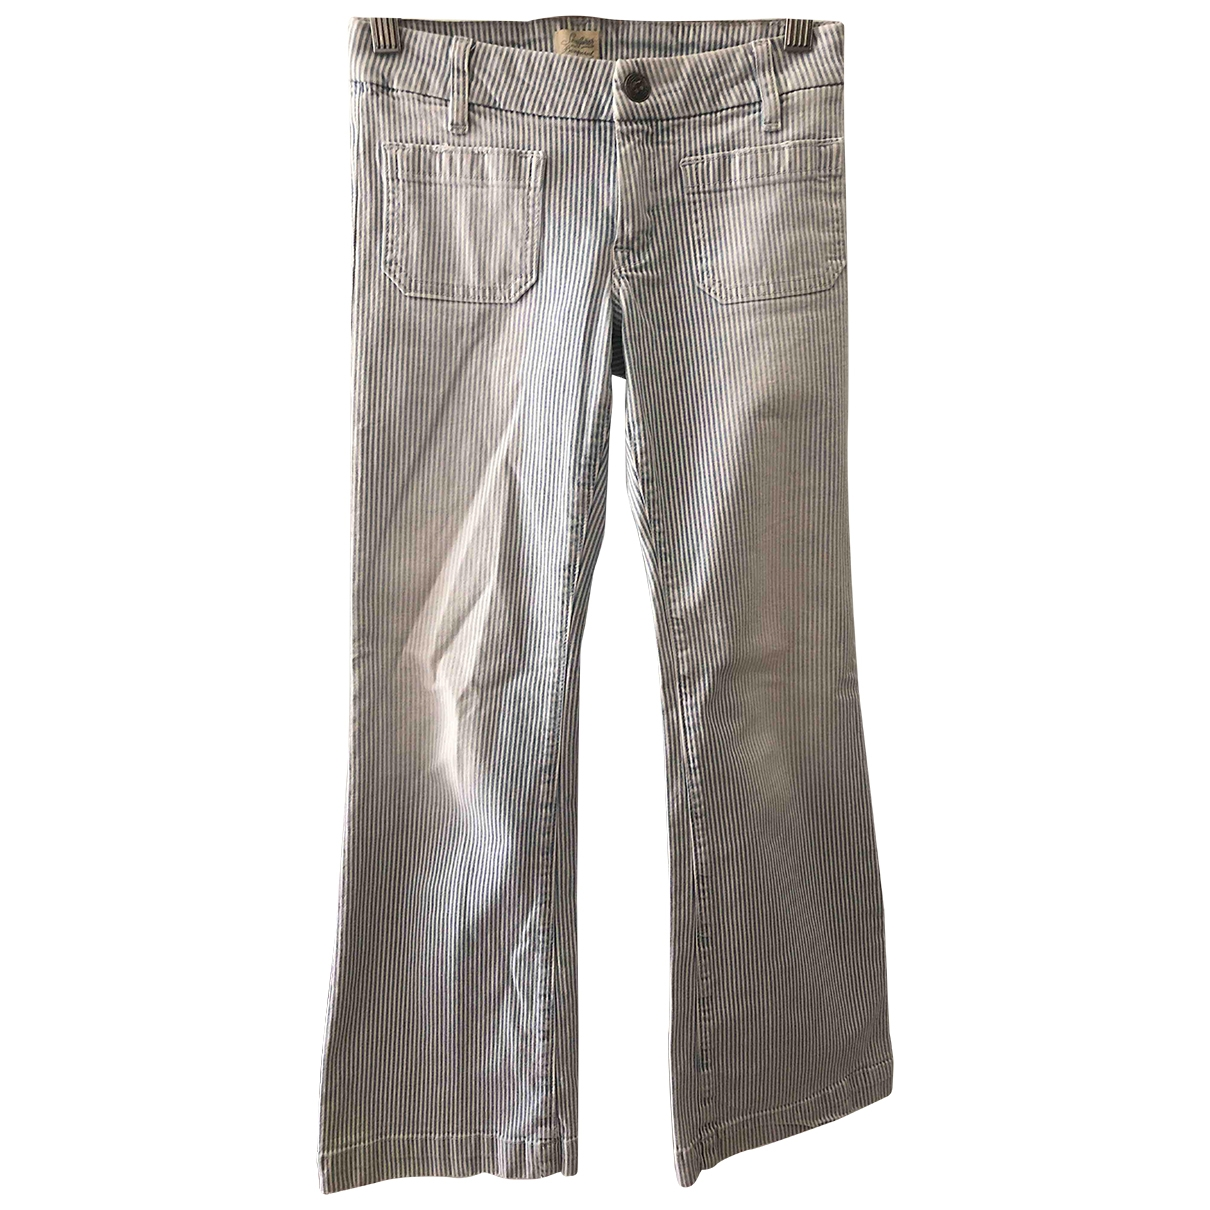 Pantalones en Algodon Seafarer